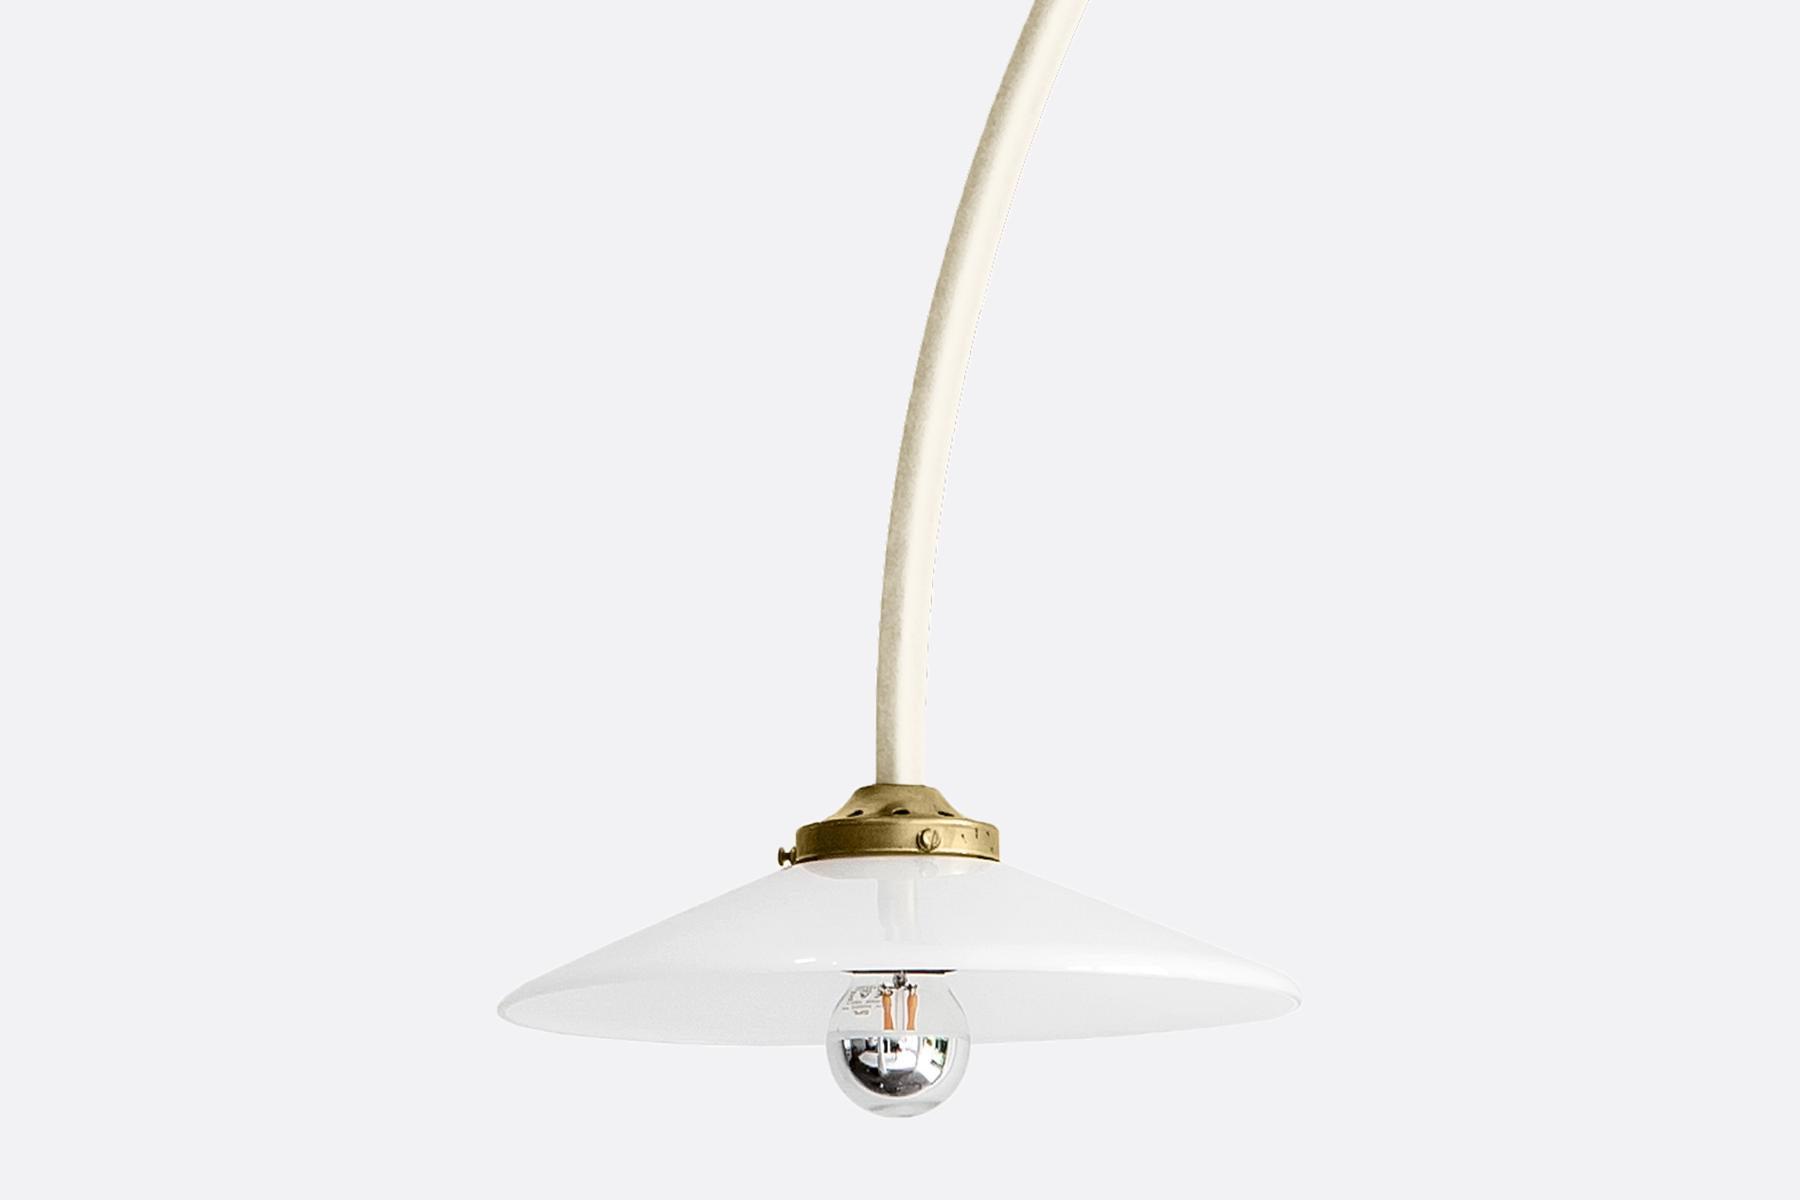 N3 Hanging Lamp